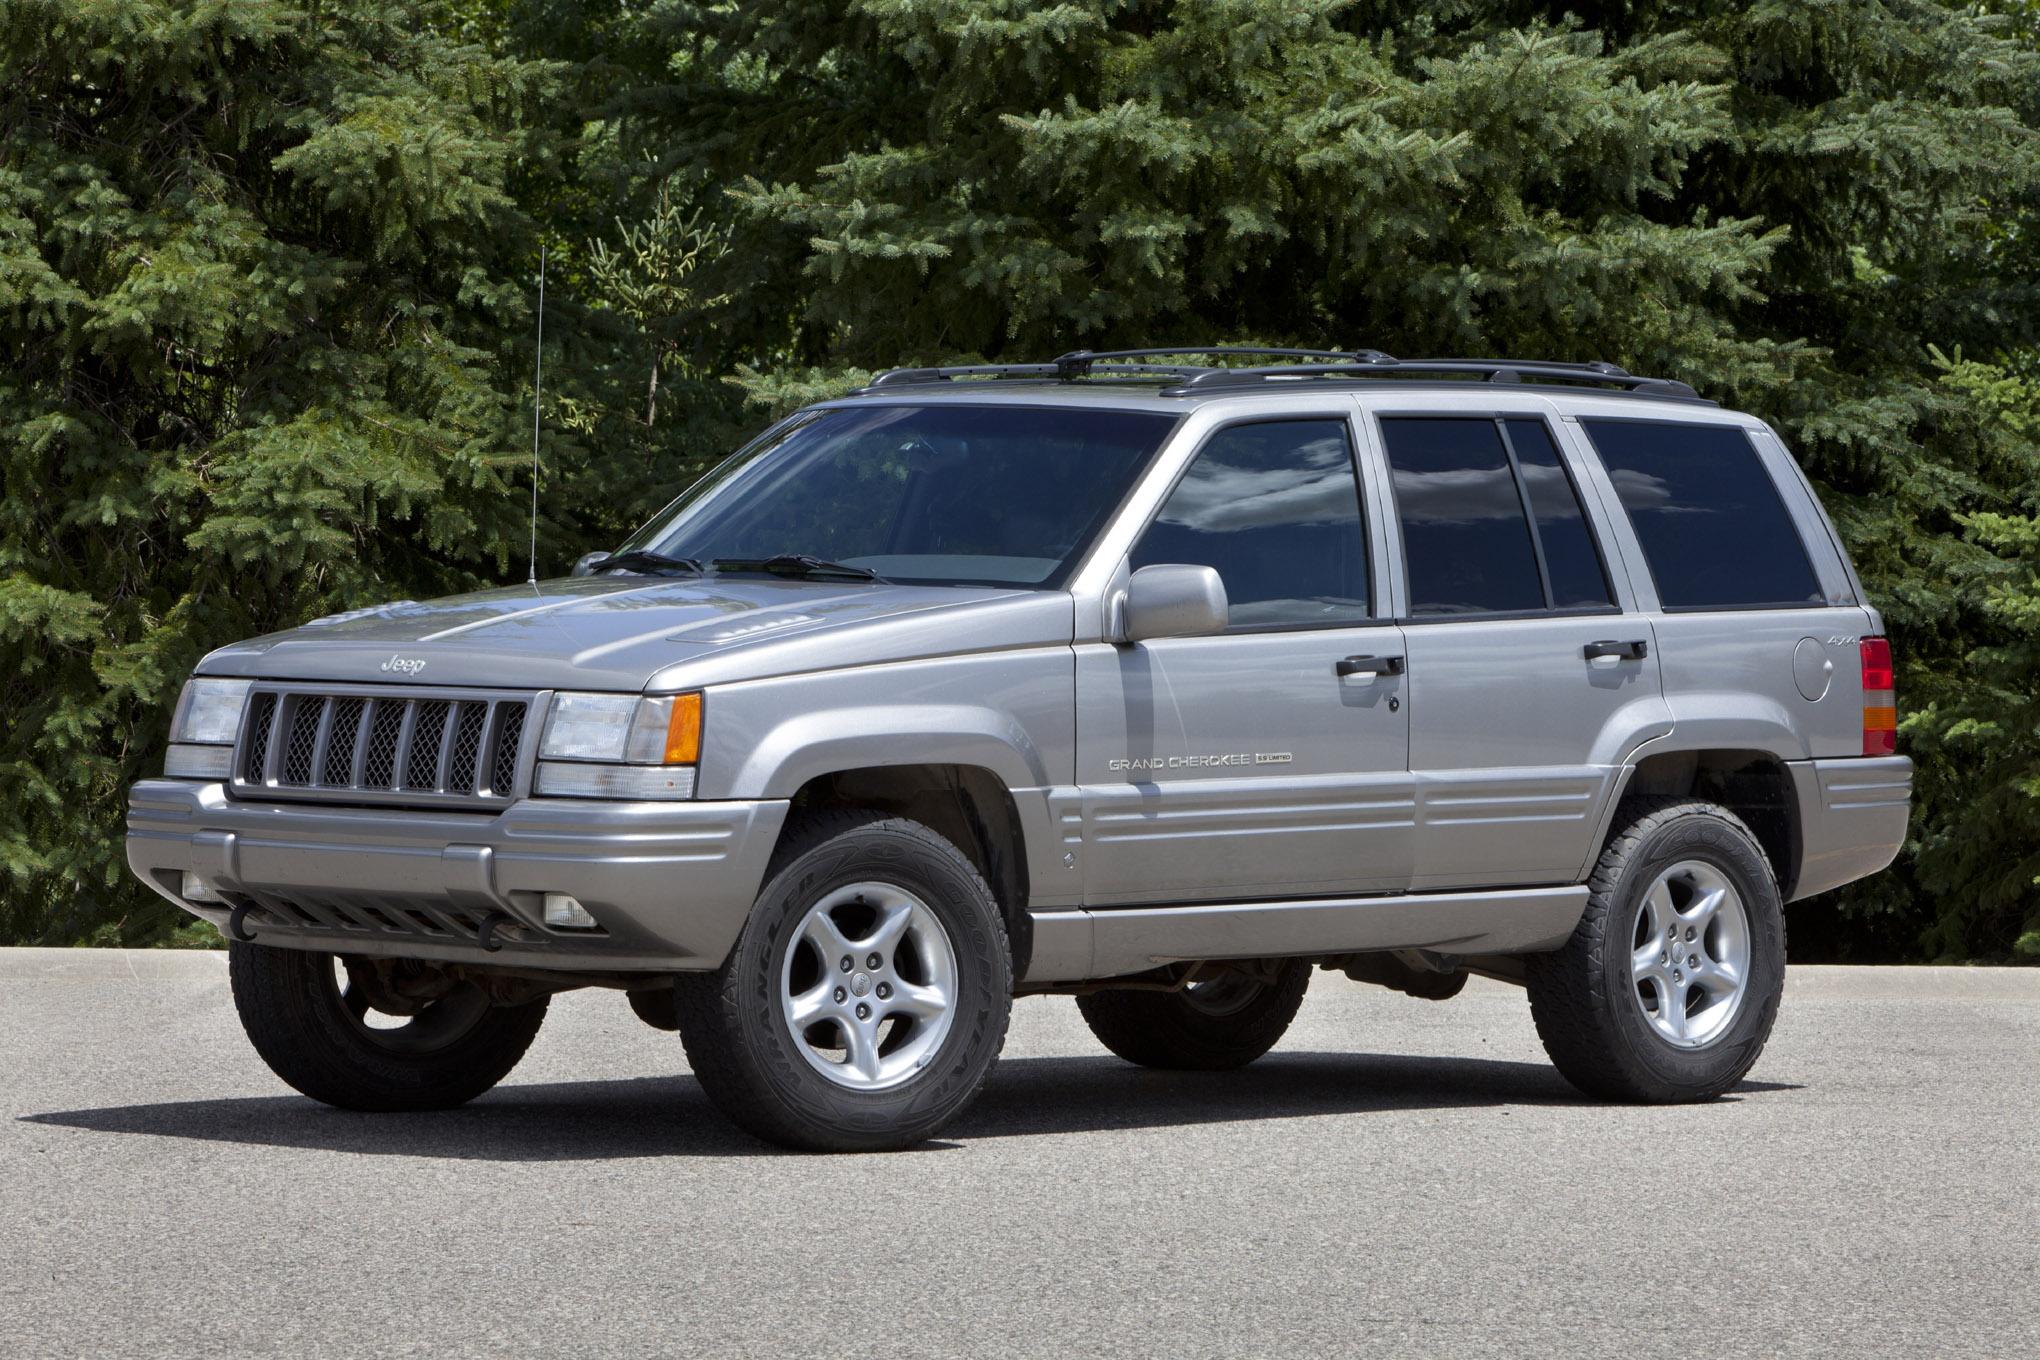 003 auto news jp jeep grand cherokee owners keeping longest